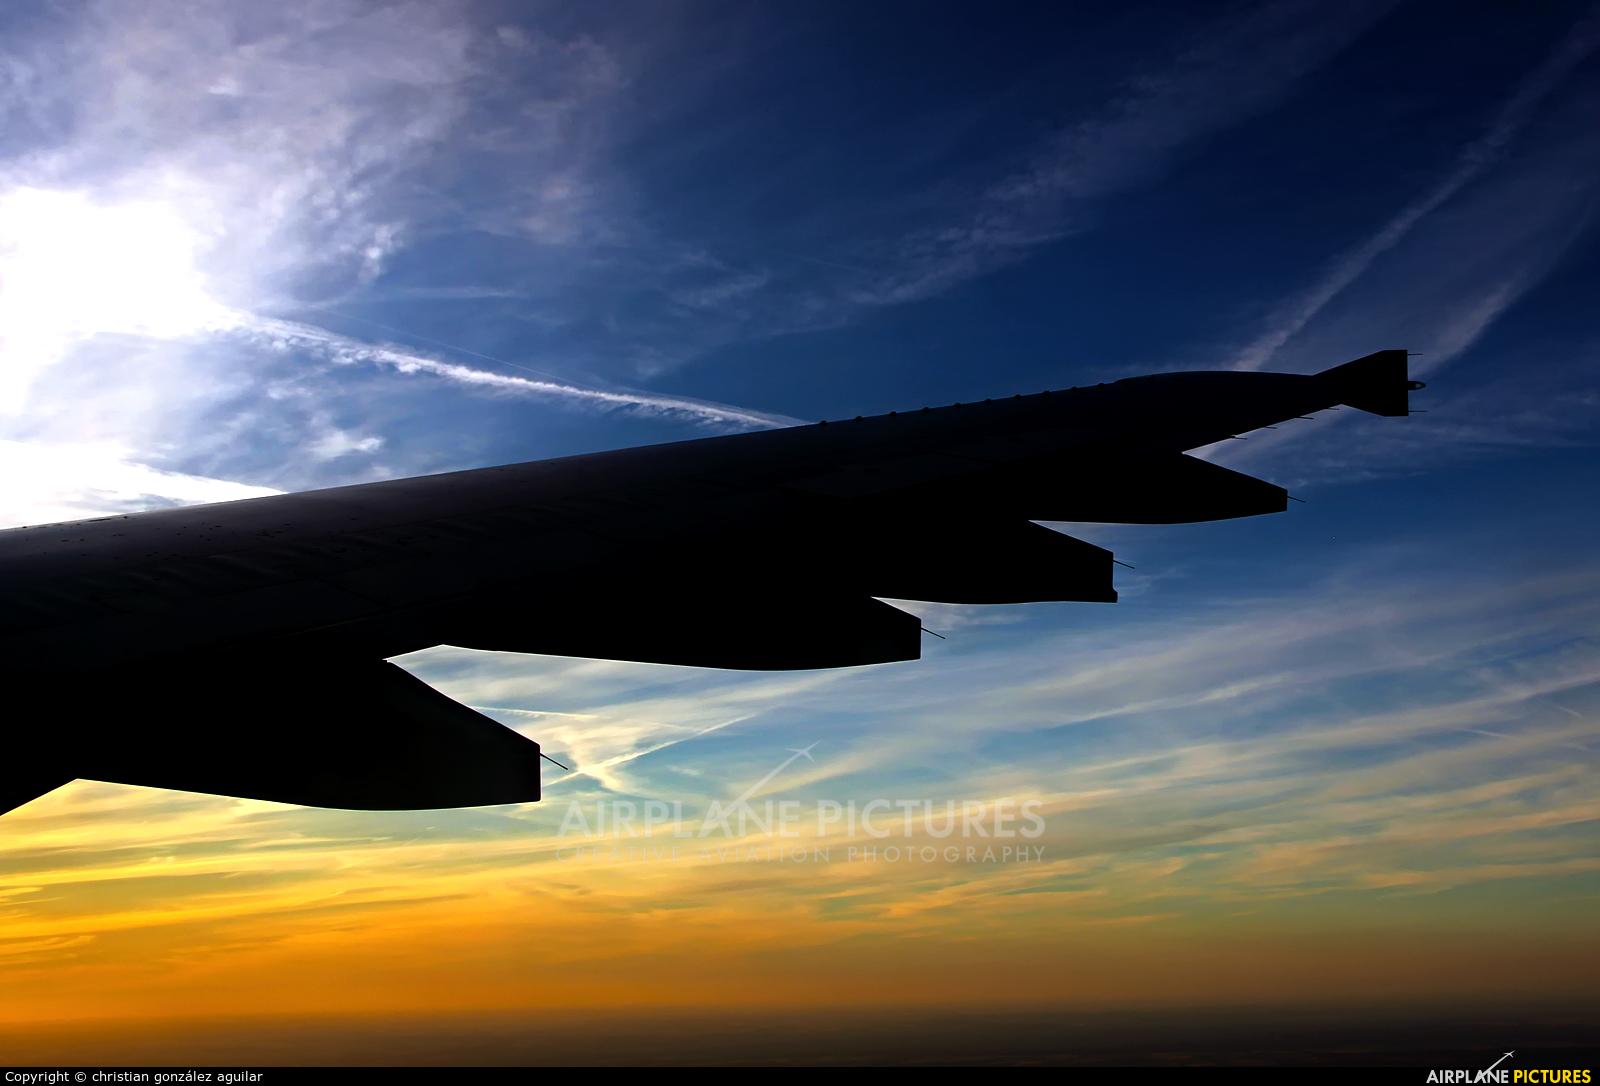 Kuwait Airways 9K-AMA aircraft at In Flight - France